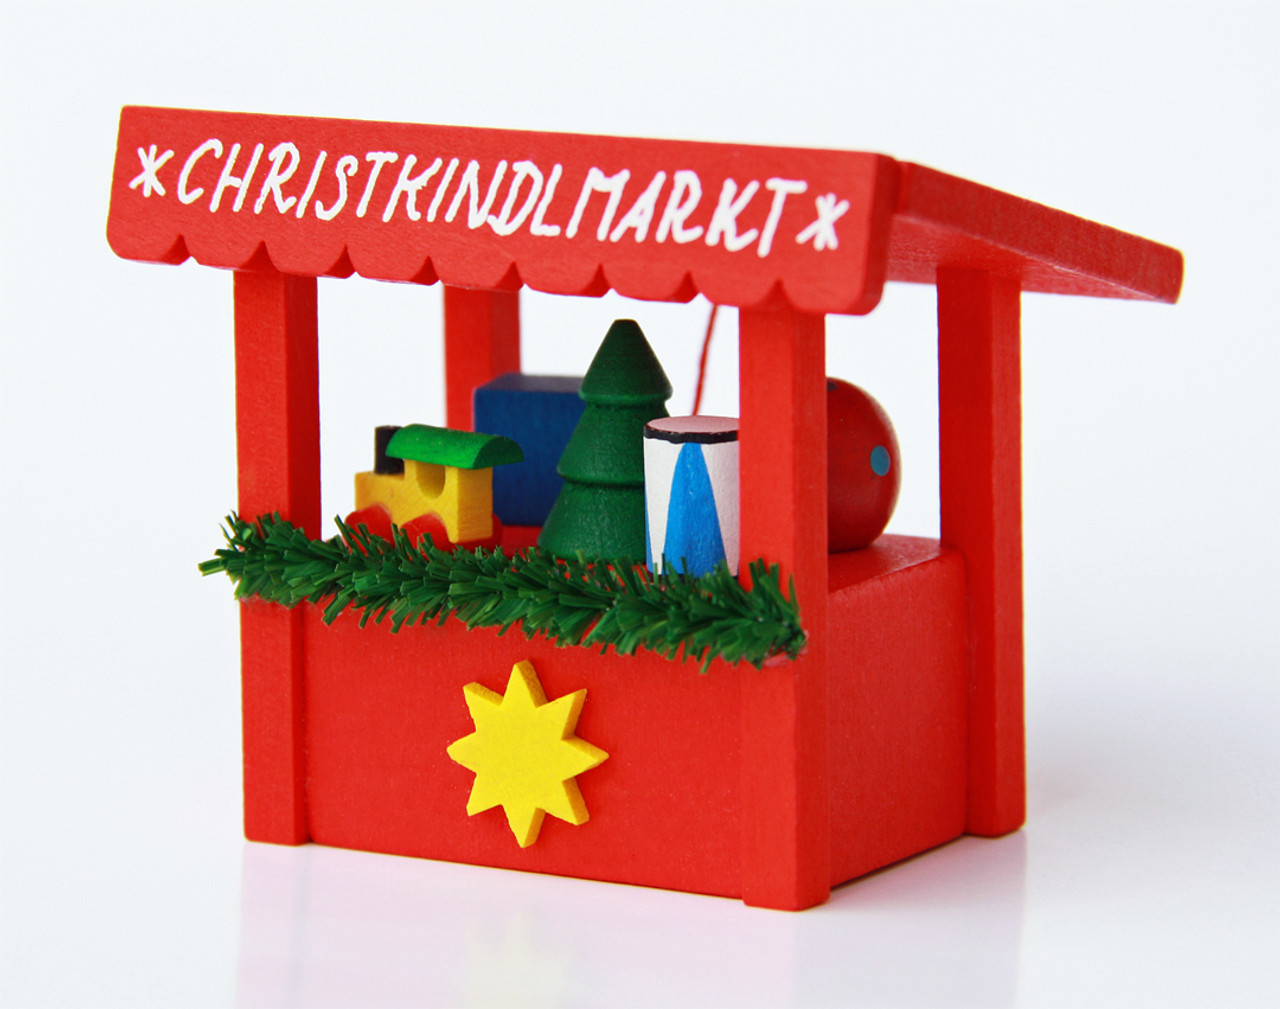 Christmas Market Wooden German Christmas Ornament